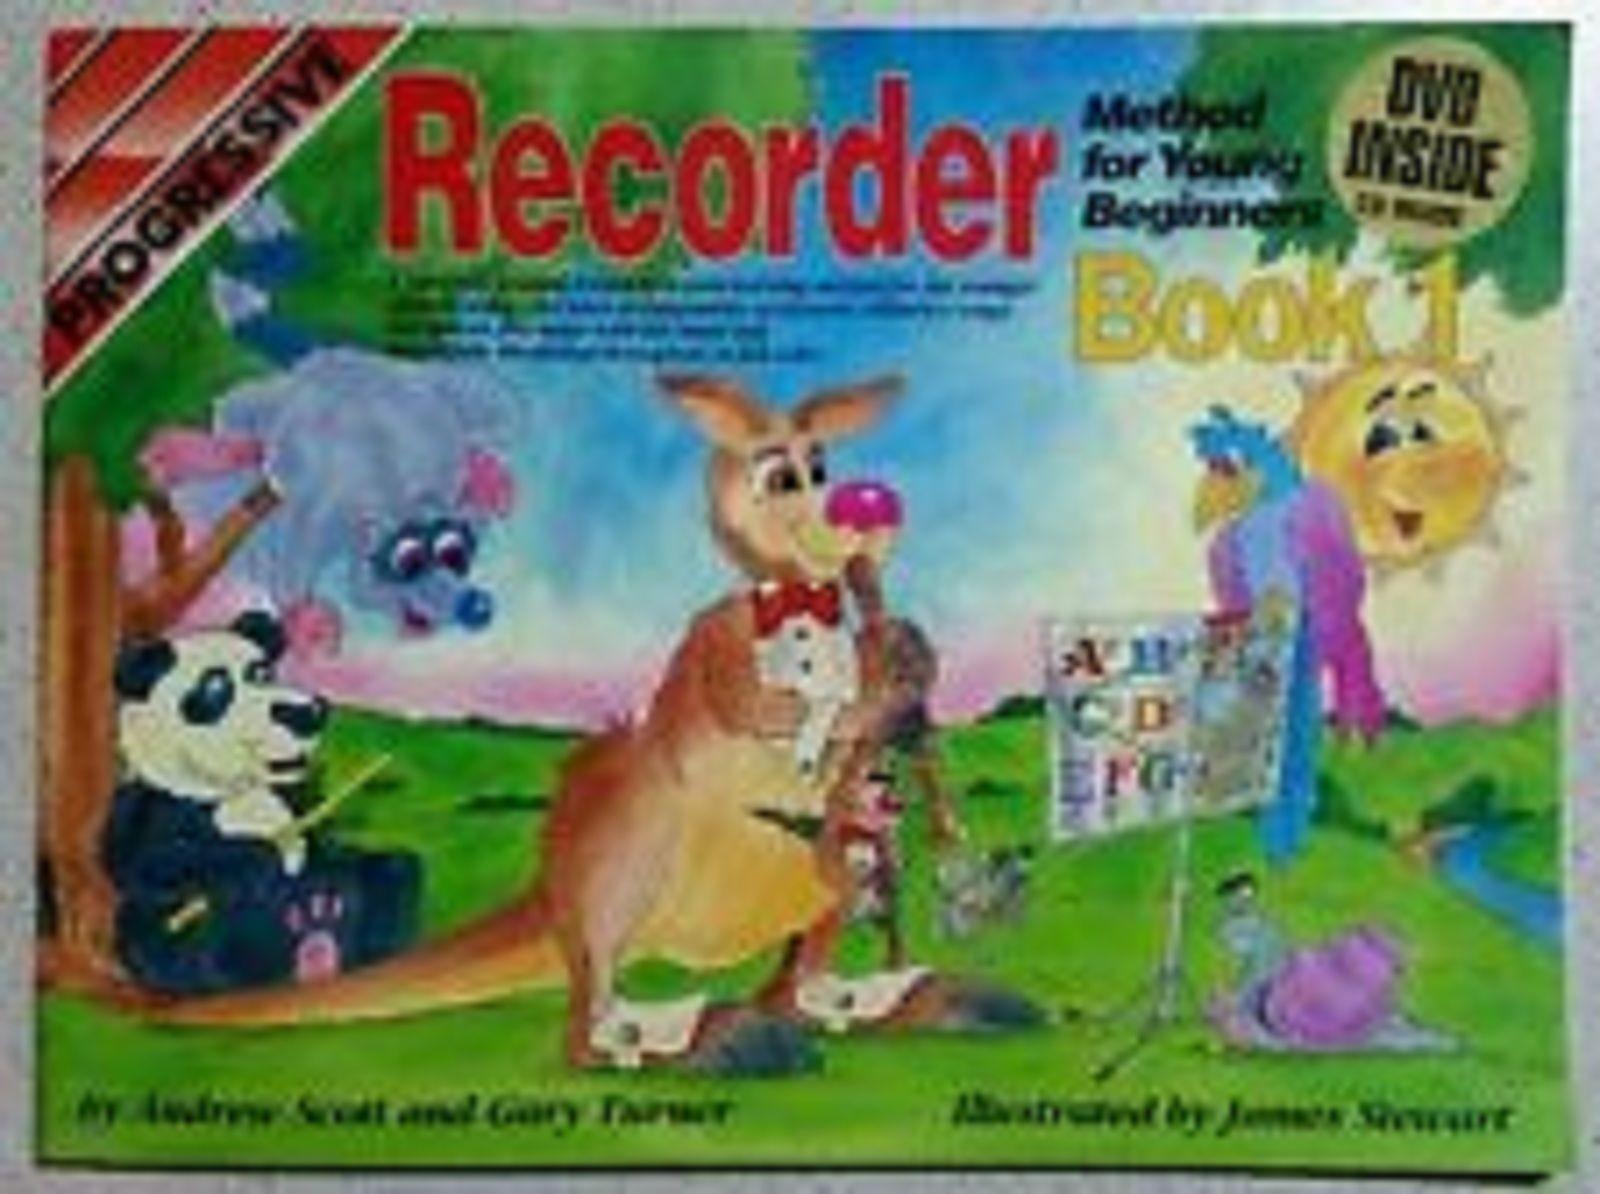 Progressive Recorder Book 1 Beginner Sheet Music CD DVD Illustrated S104